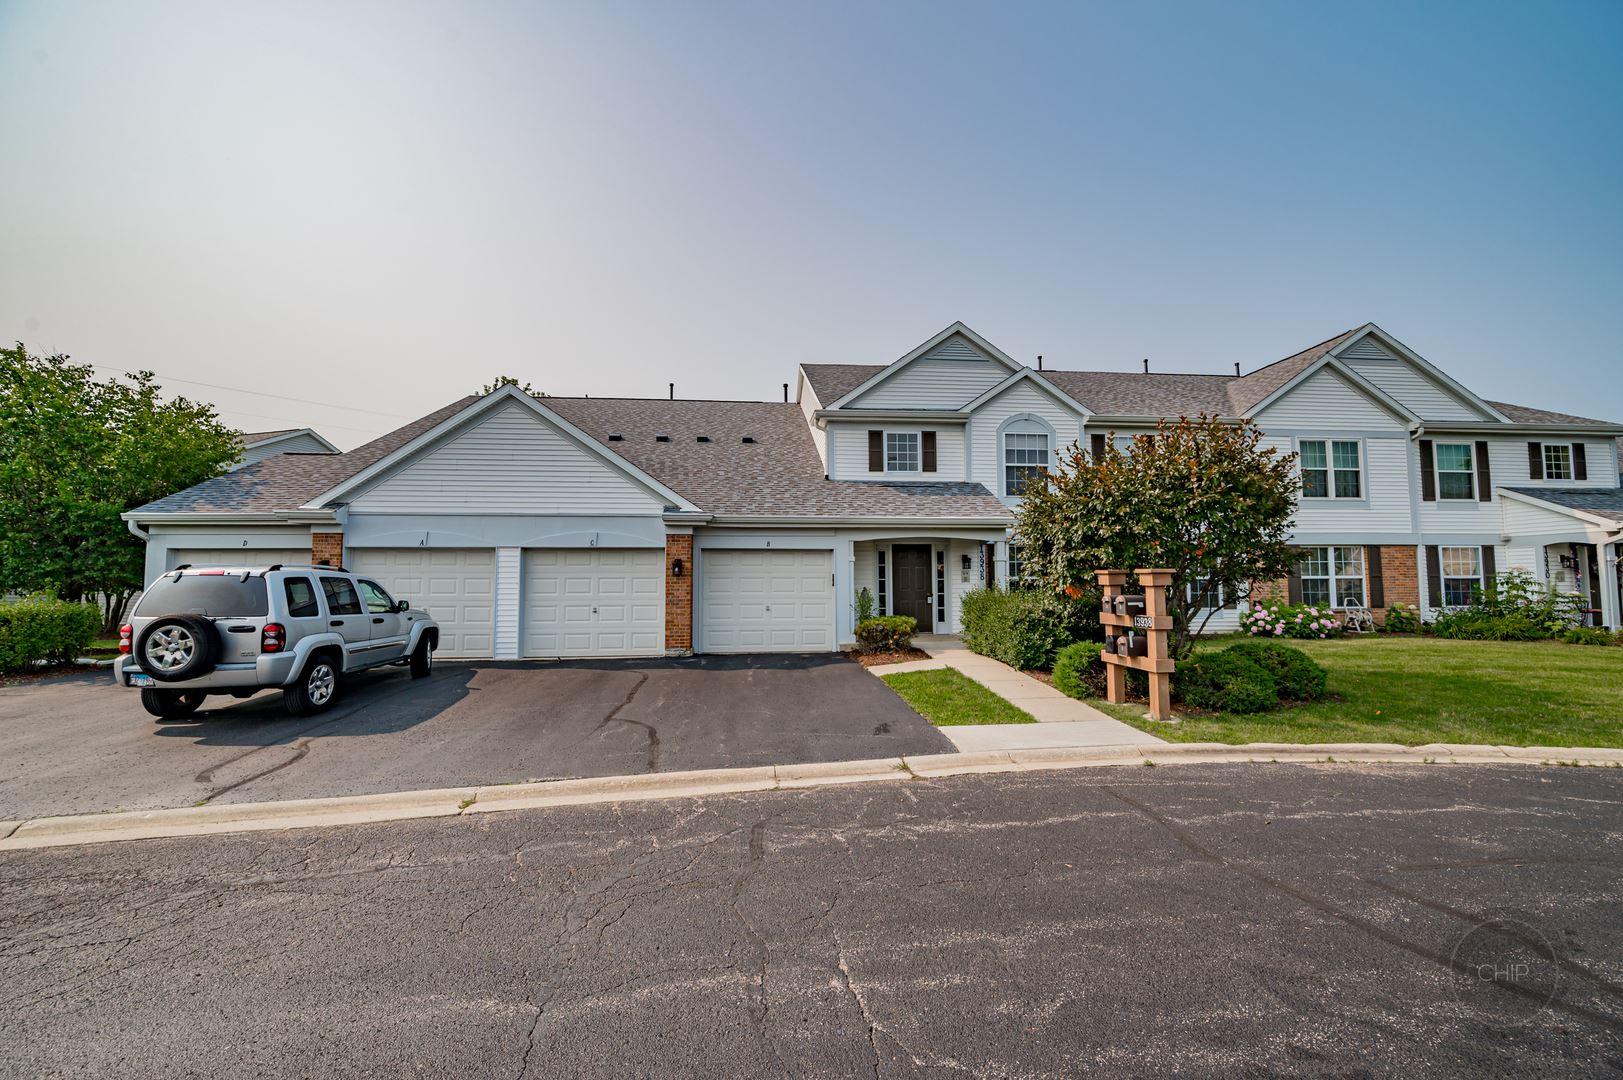 Photo of 13938 S Bristlecone Lane #B, Plainfield, IL 60544 (MLS # 11162877)